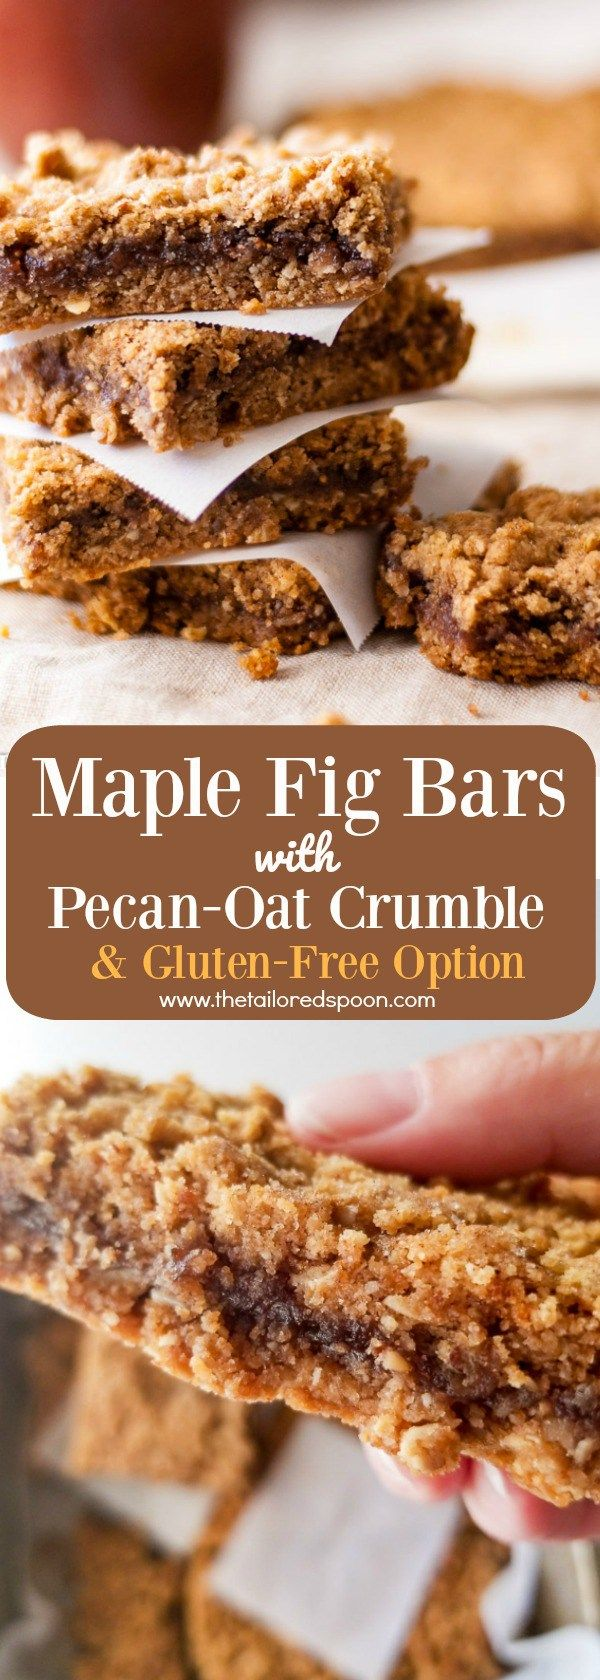 Maple Fig Bars